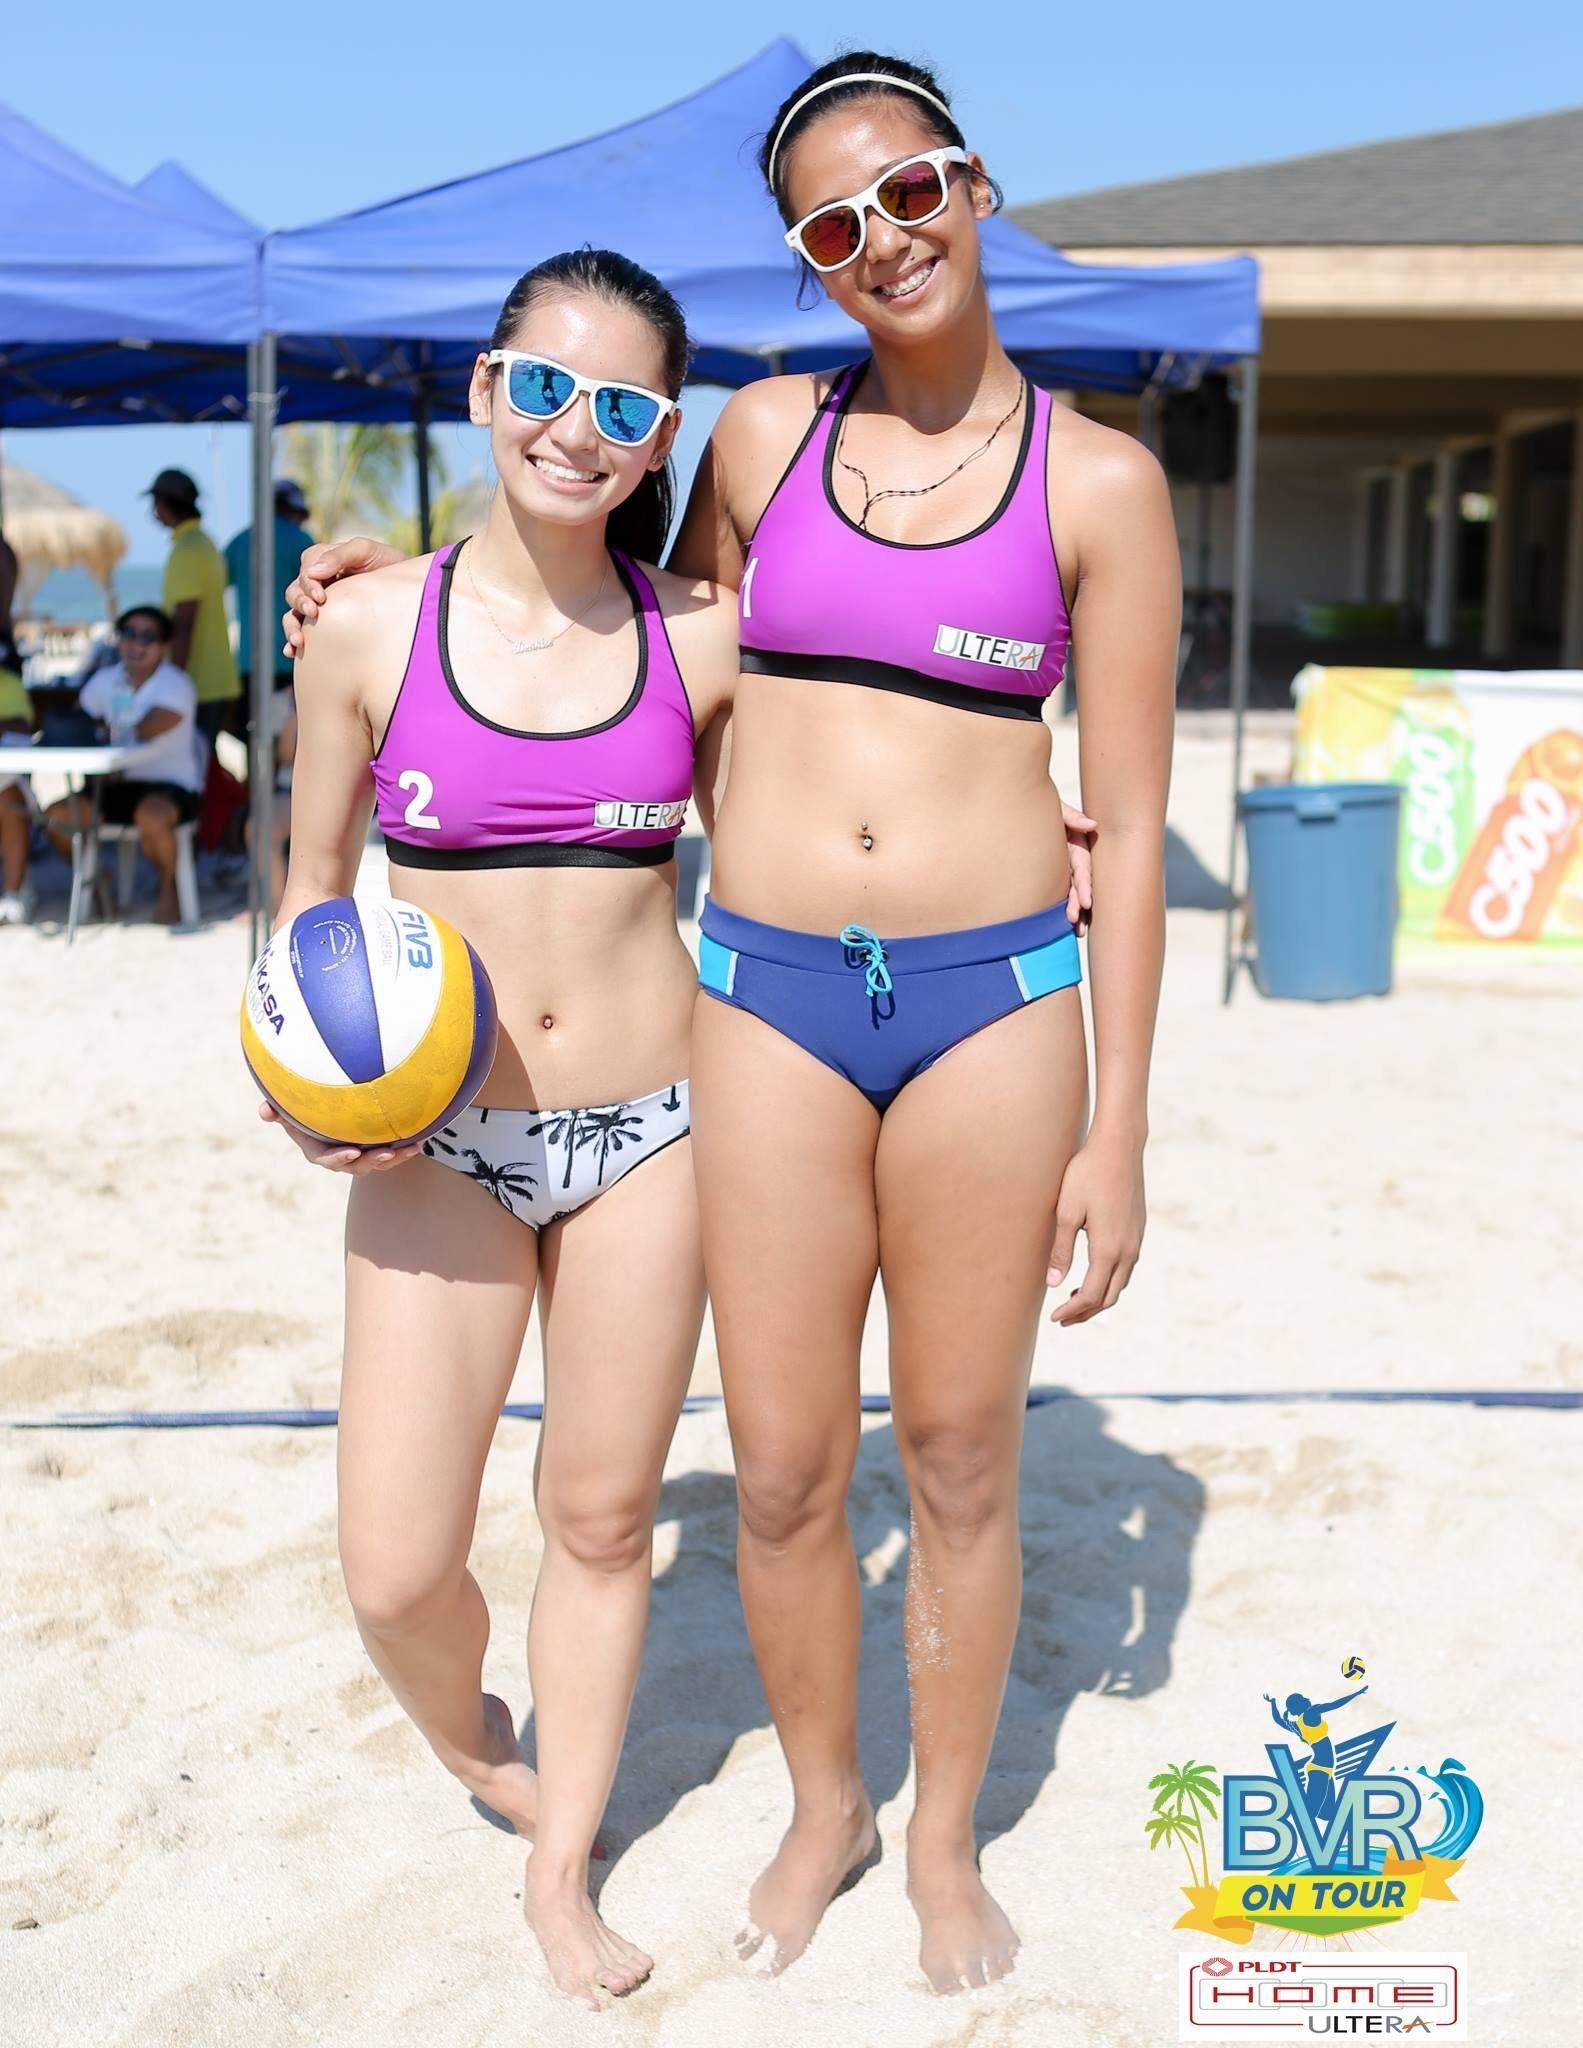 Pin By Rio Mns On Volleyball Philippine Women High Neck Bikinis Beach Volleyball